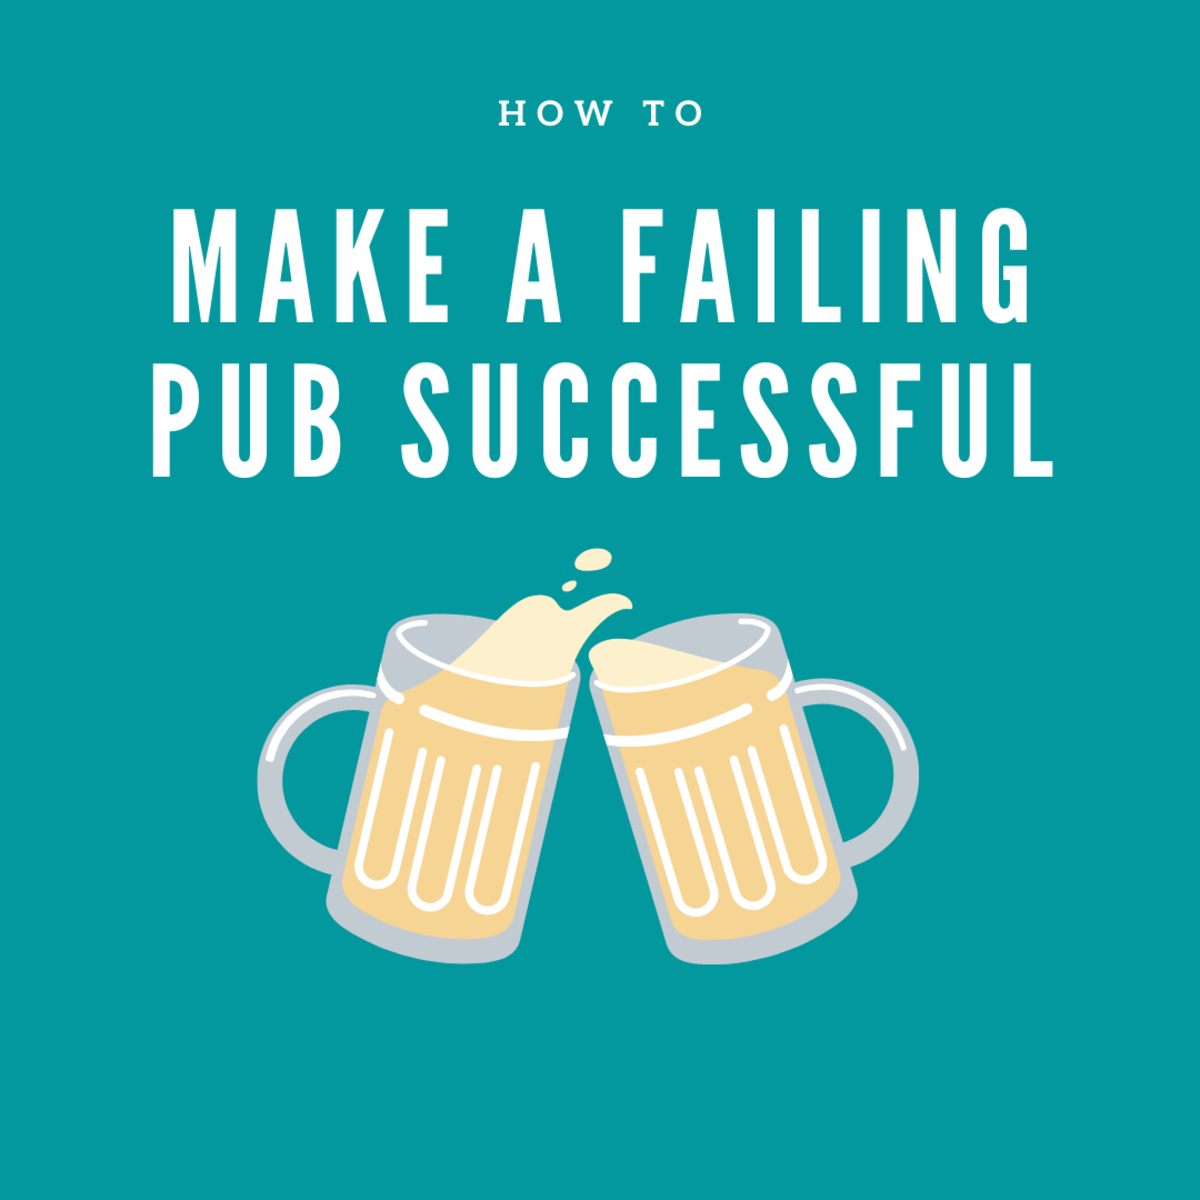 5 Tips on How to Make a Failing Pub Successful